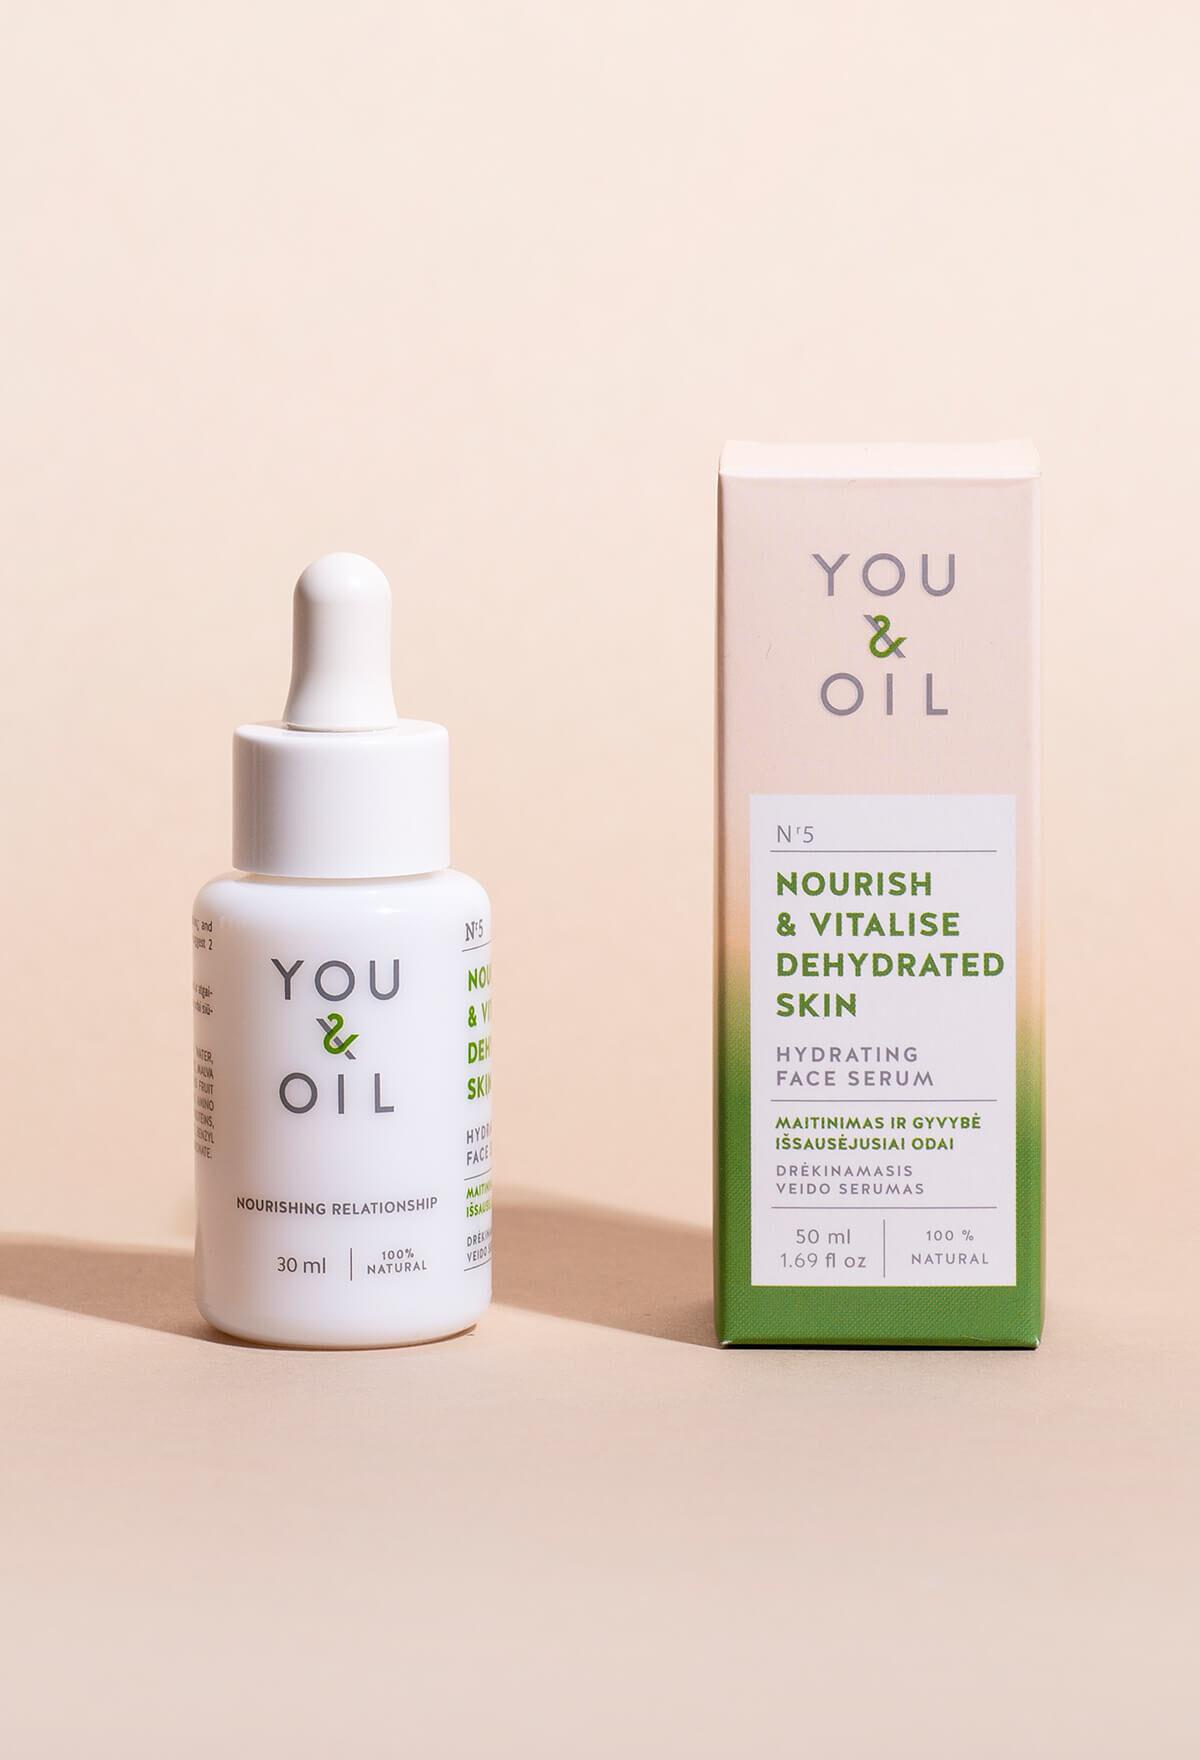 1295Nourish & Vitalise Dehydrated Skin